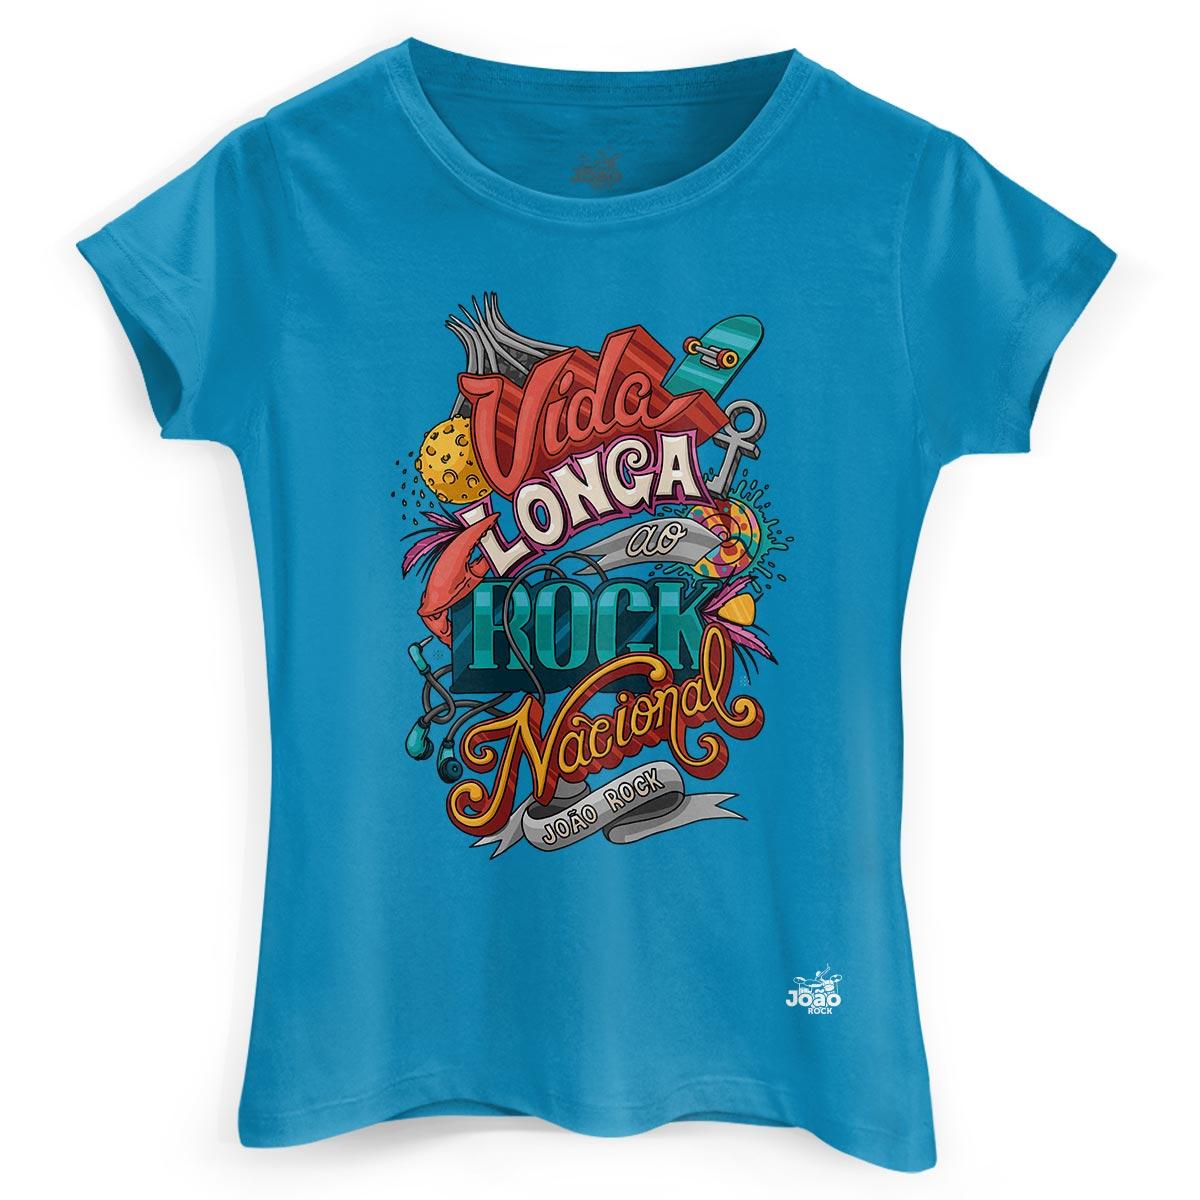 Camiseta Feminina João Rock Vida Longa ao Rock Nacional 3